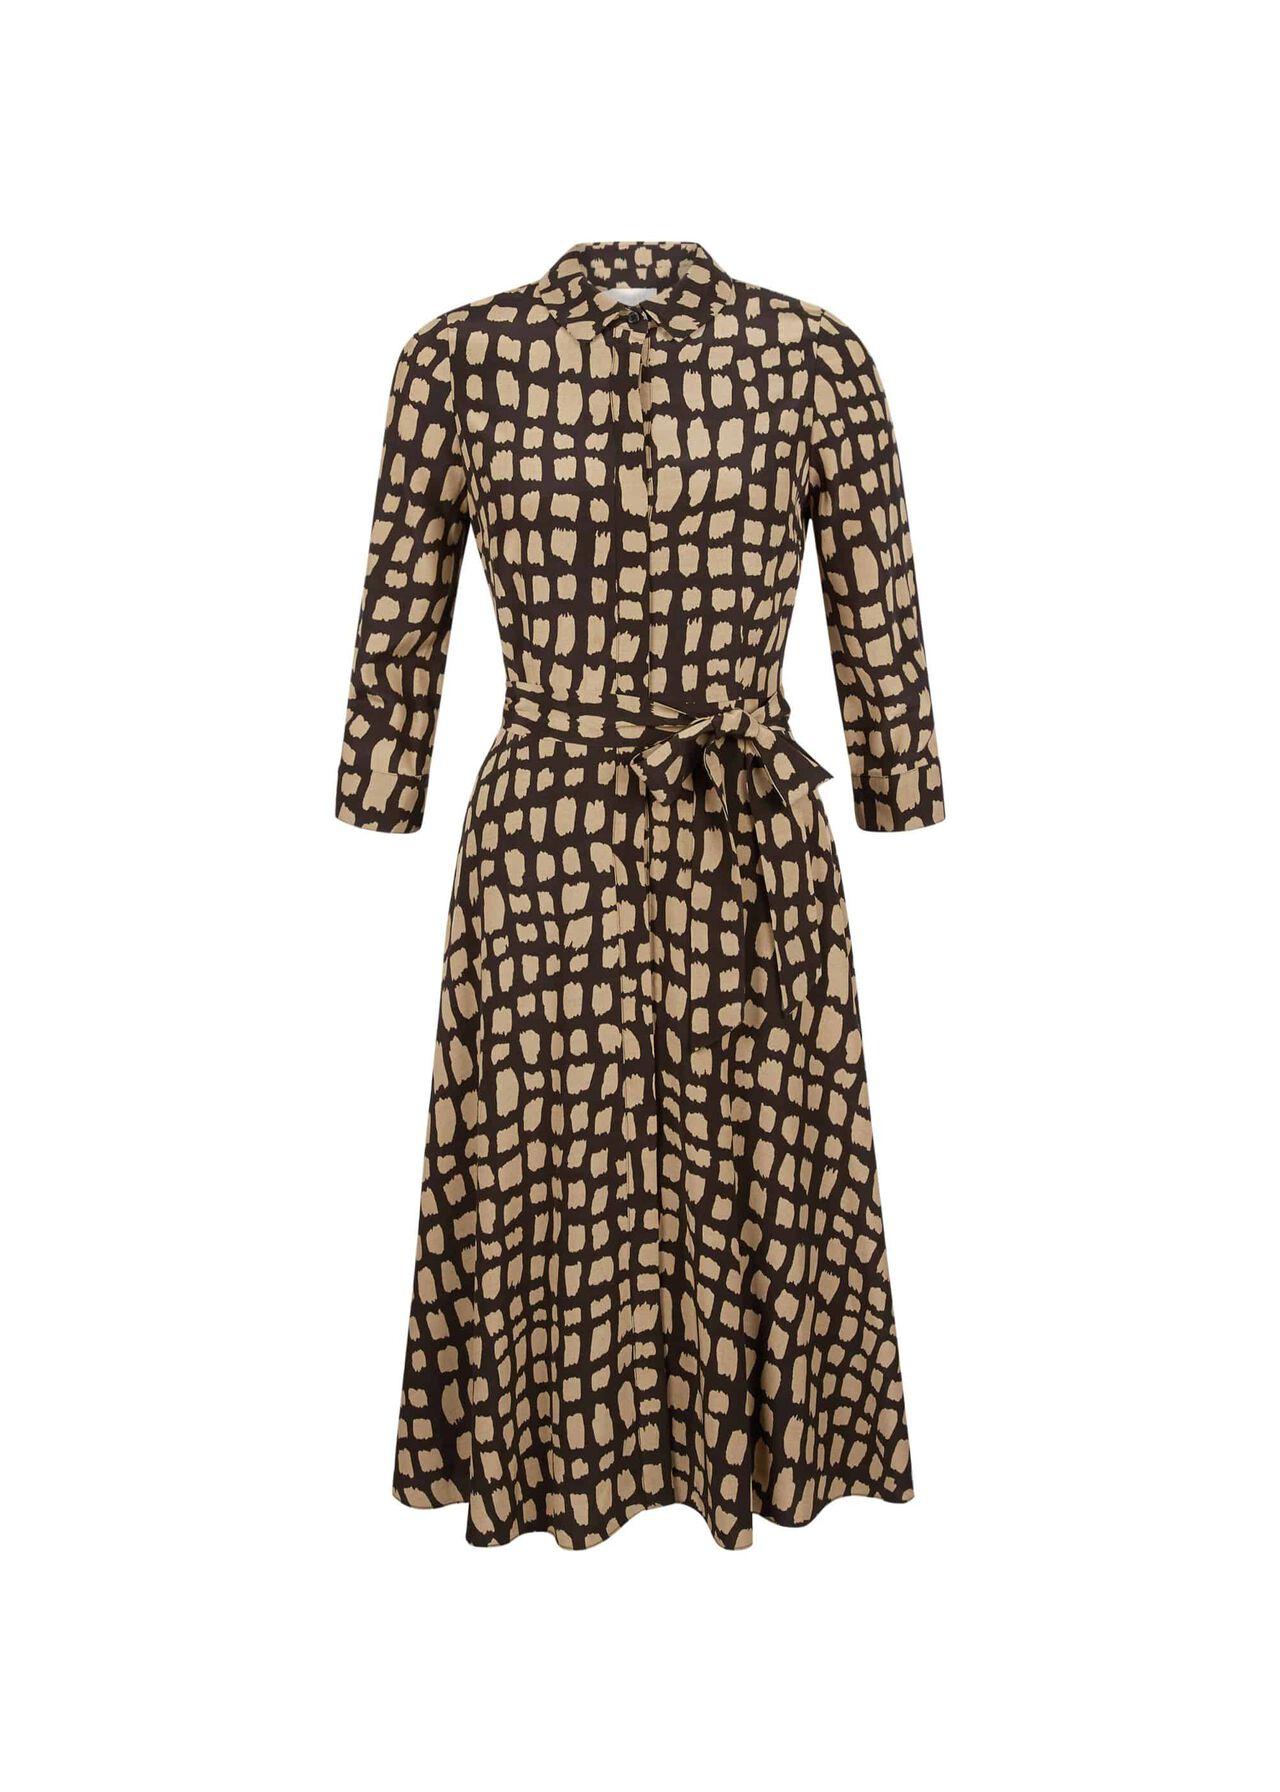 Petite Lainey Dress Black Camel